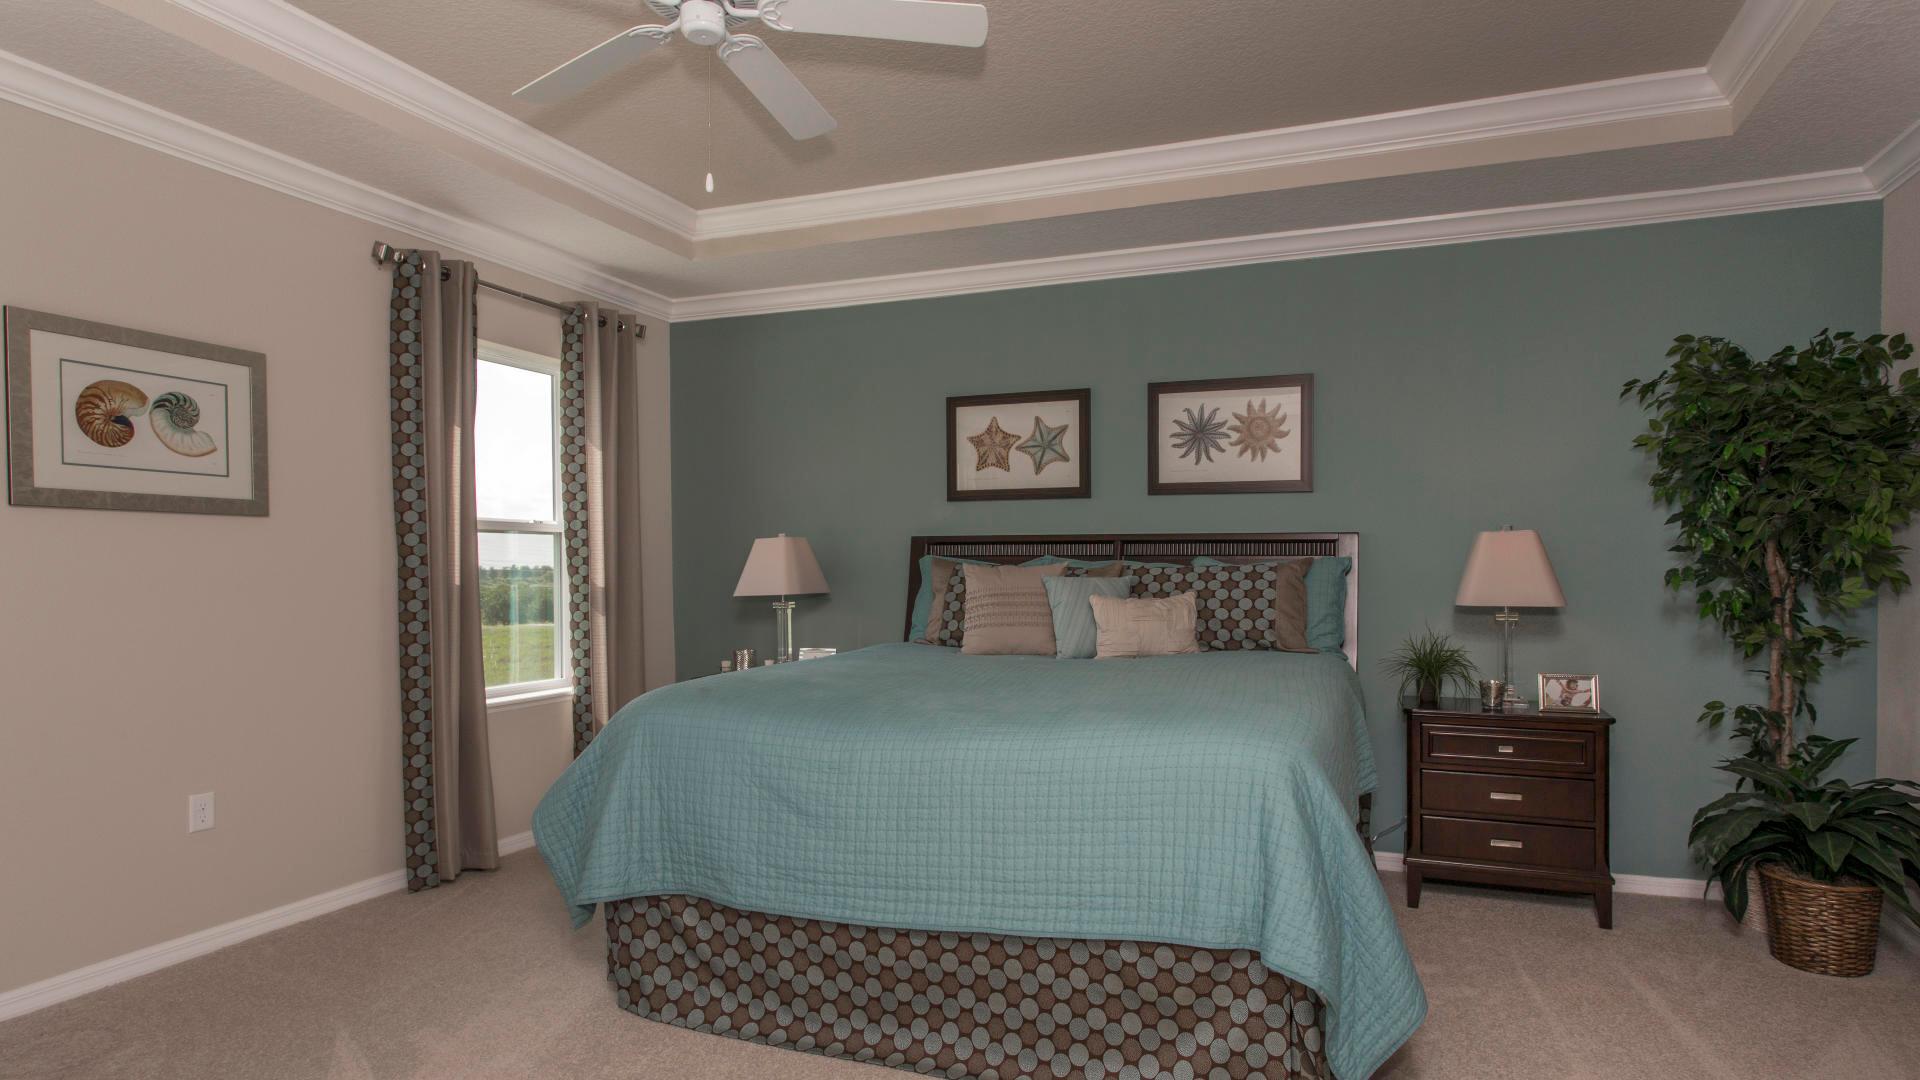 Bedroom featured in the Sierra By Maronda Homes in Daytona Beach, FL